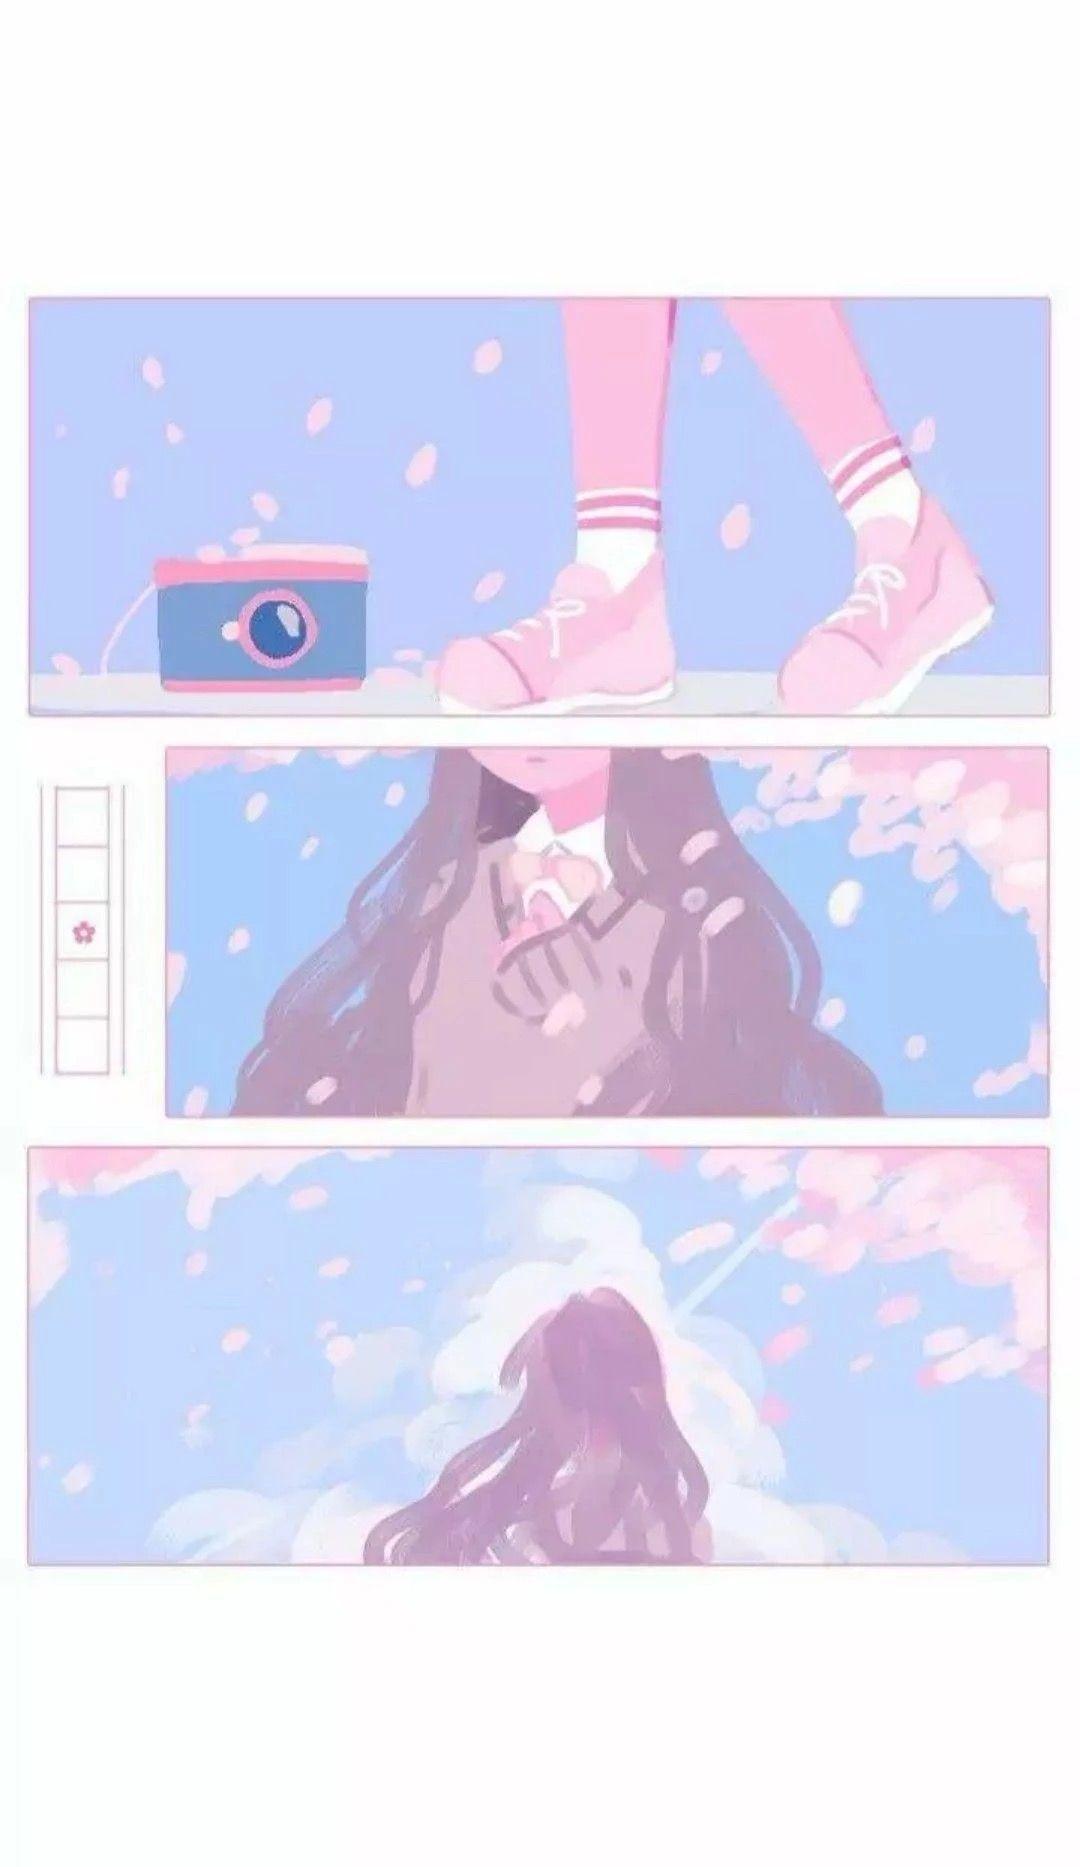 Soft Aesthetic Anime Phone Backgrounds Http Wallpapersalbum Com Soft Aesthetic Anime Phone Backgrounds Html In 2020 Aesthetic Anime Anime Wallpaper Cute Art